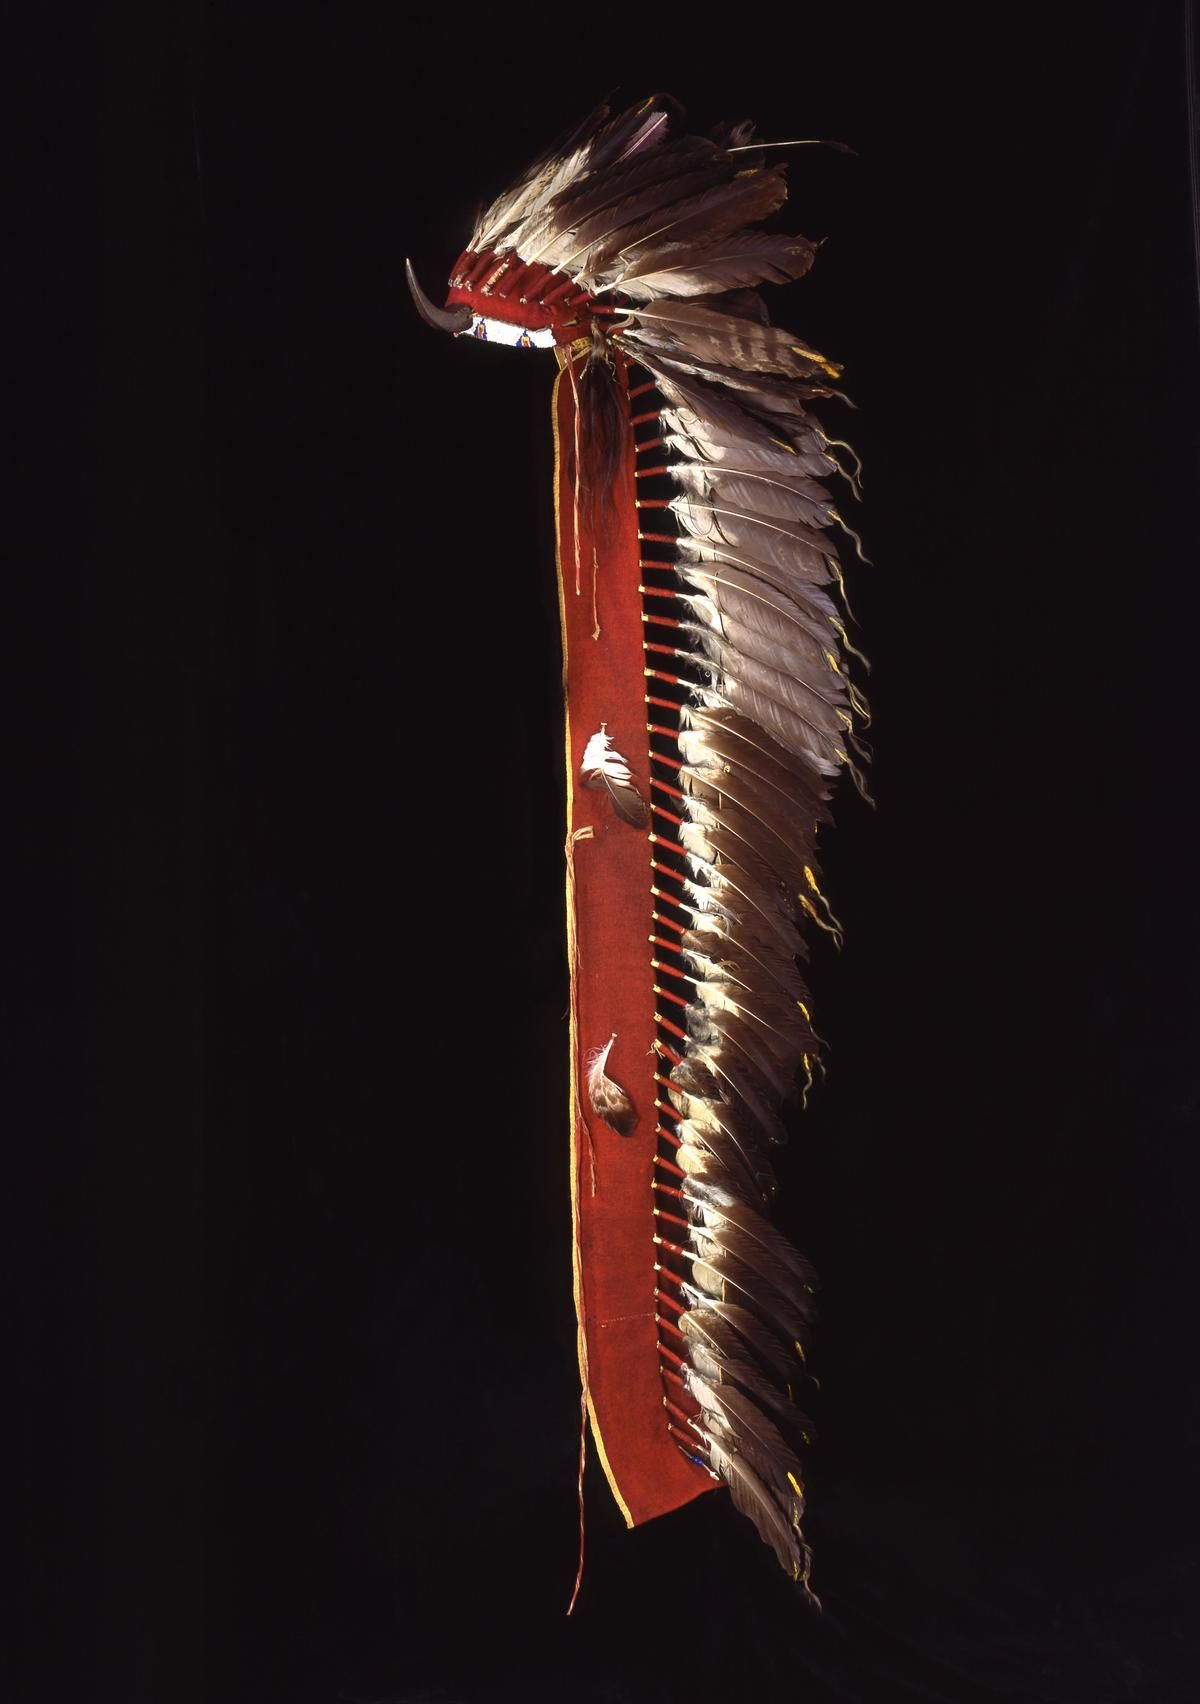 bonnet- Northern Plains- Cheyenne.ca. 1860-1865